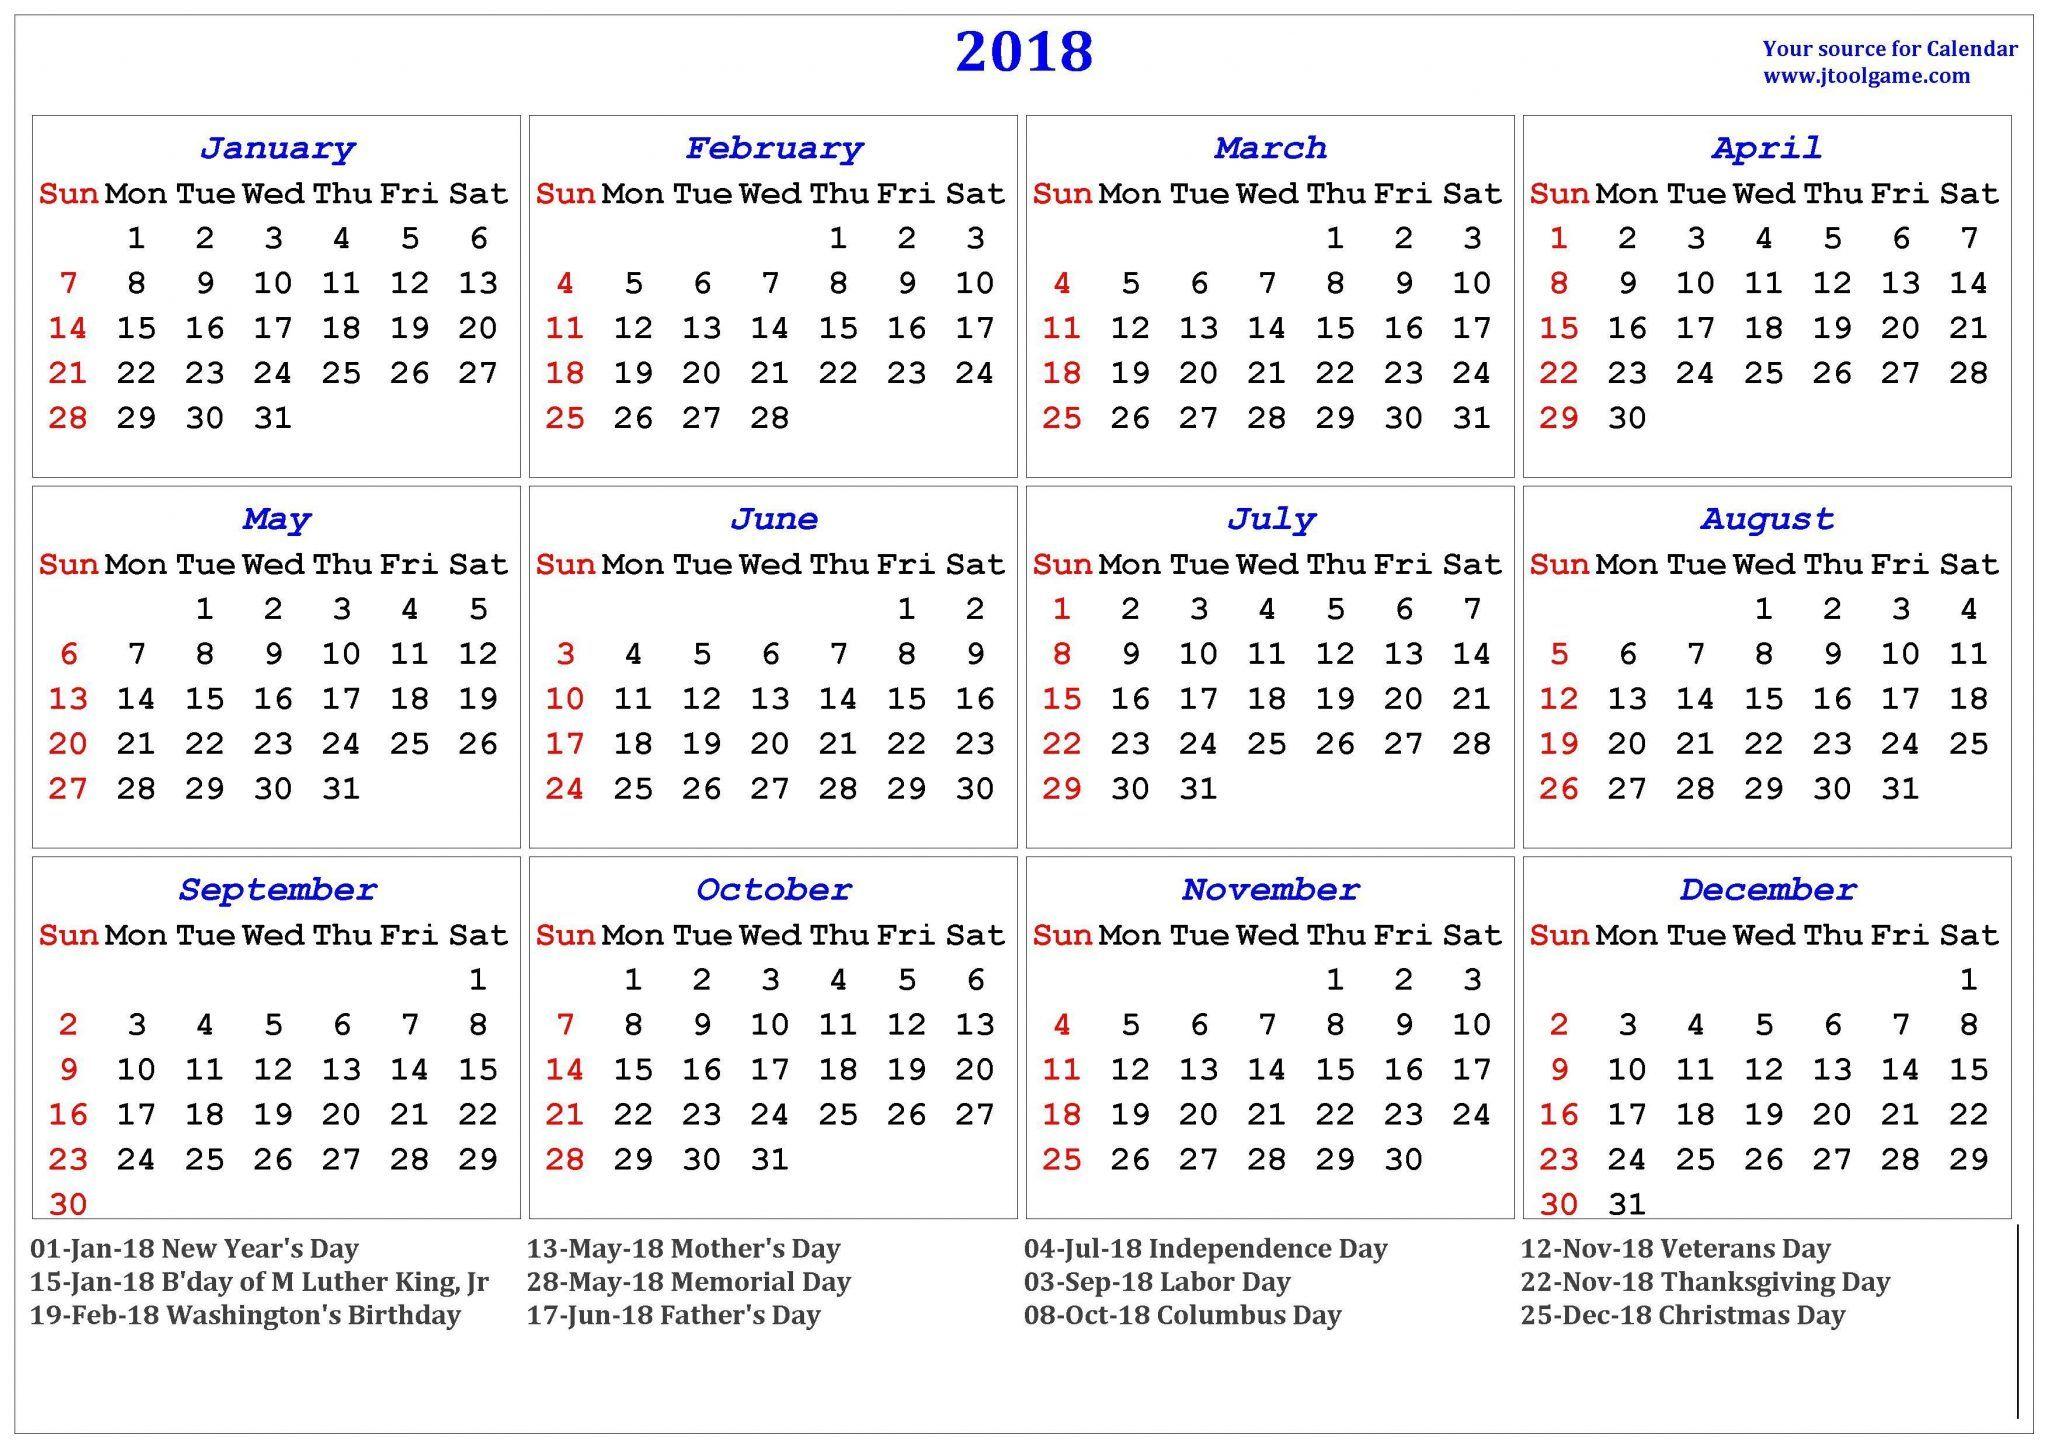 Get Calendar 2019 with USA Holidays Printable of School